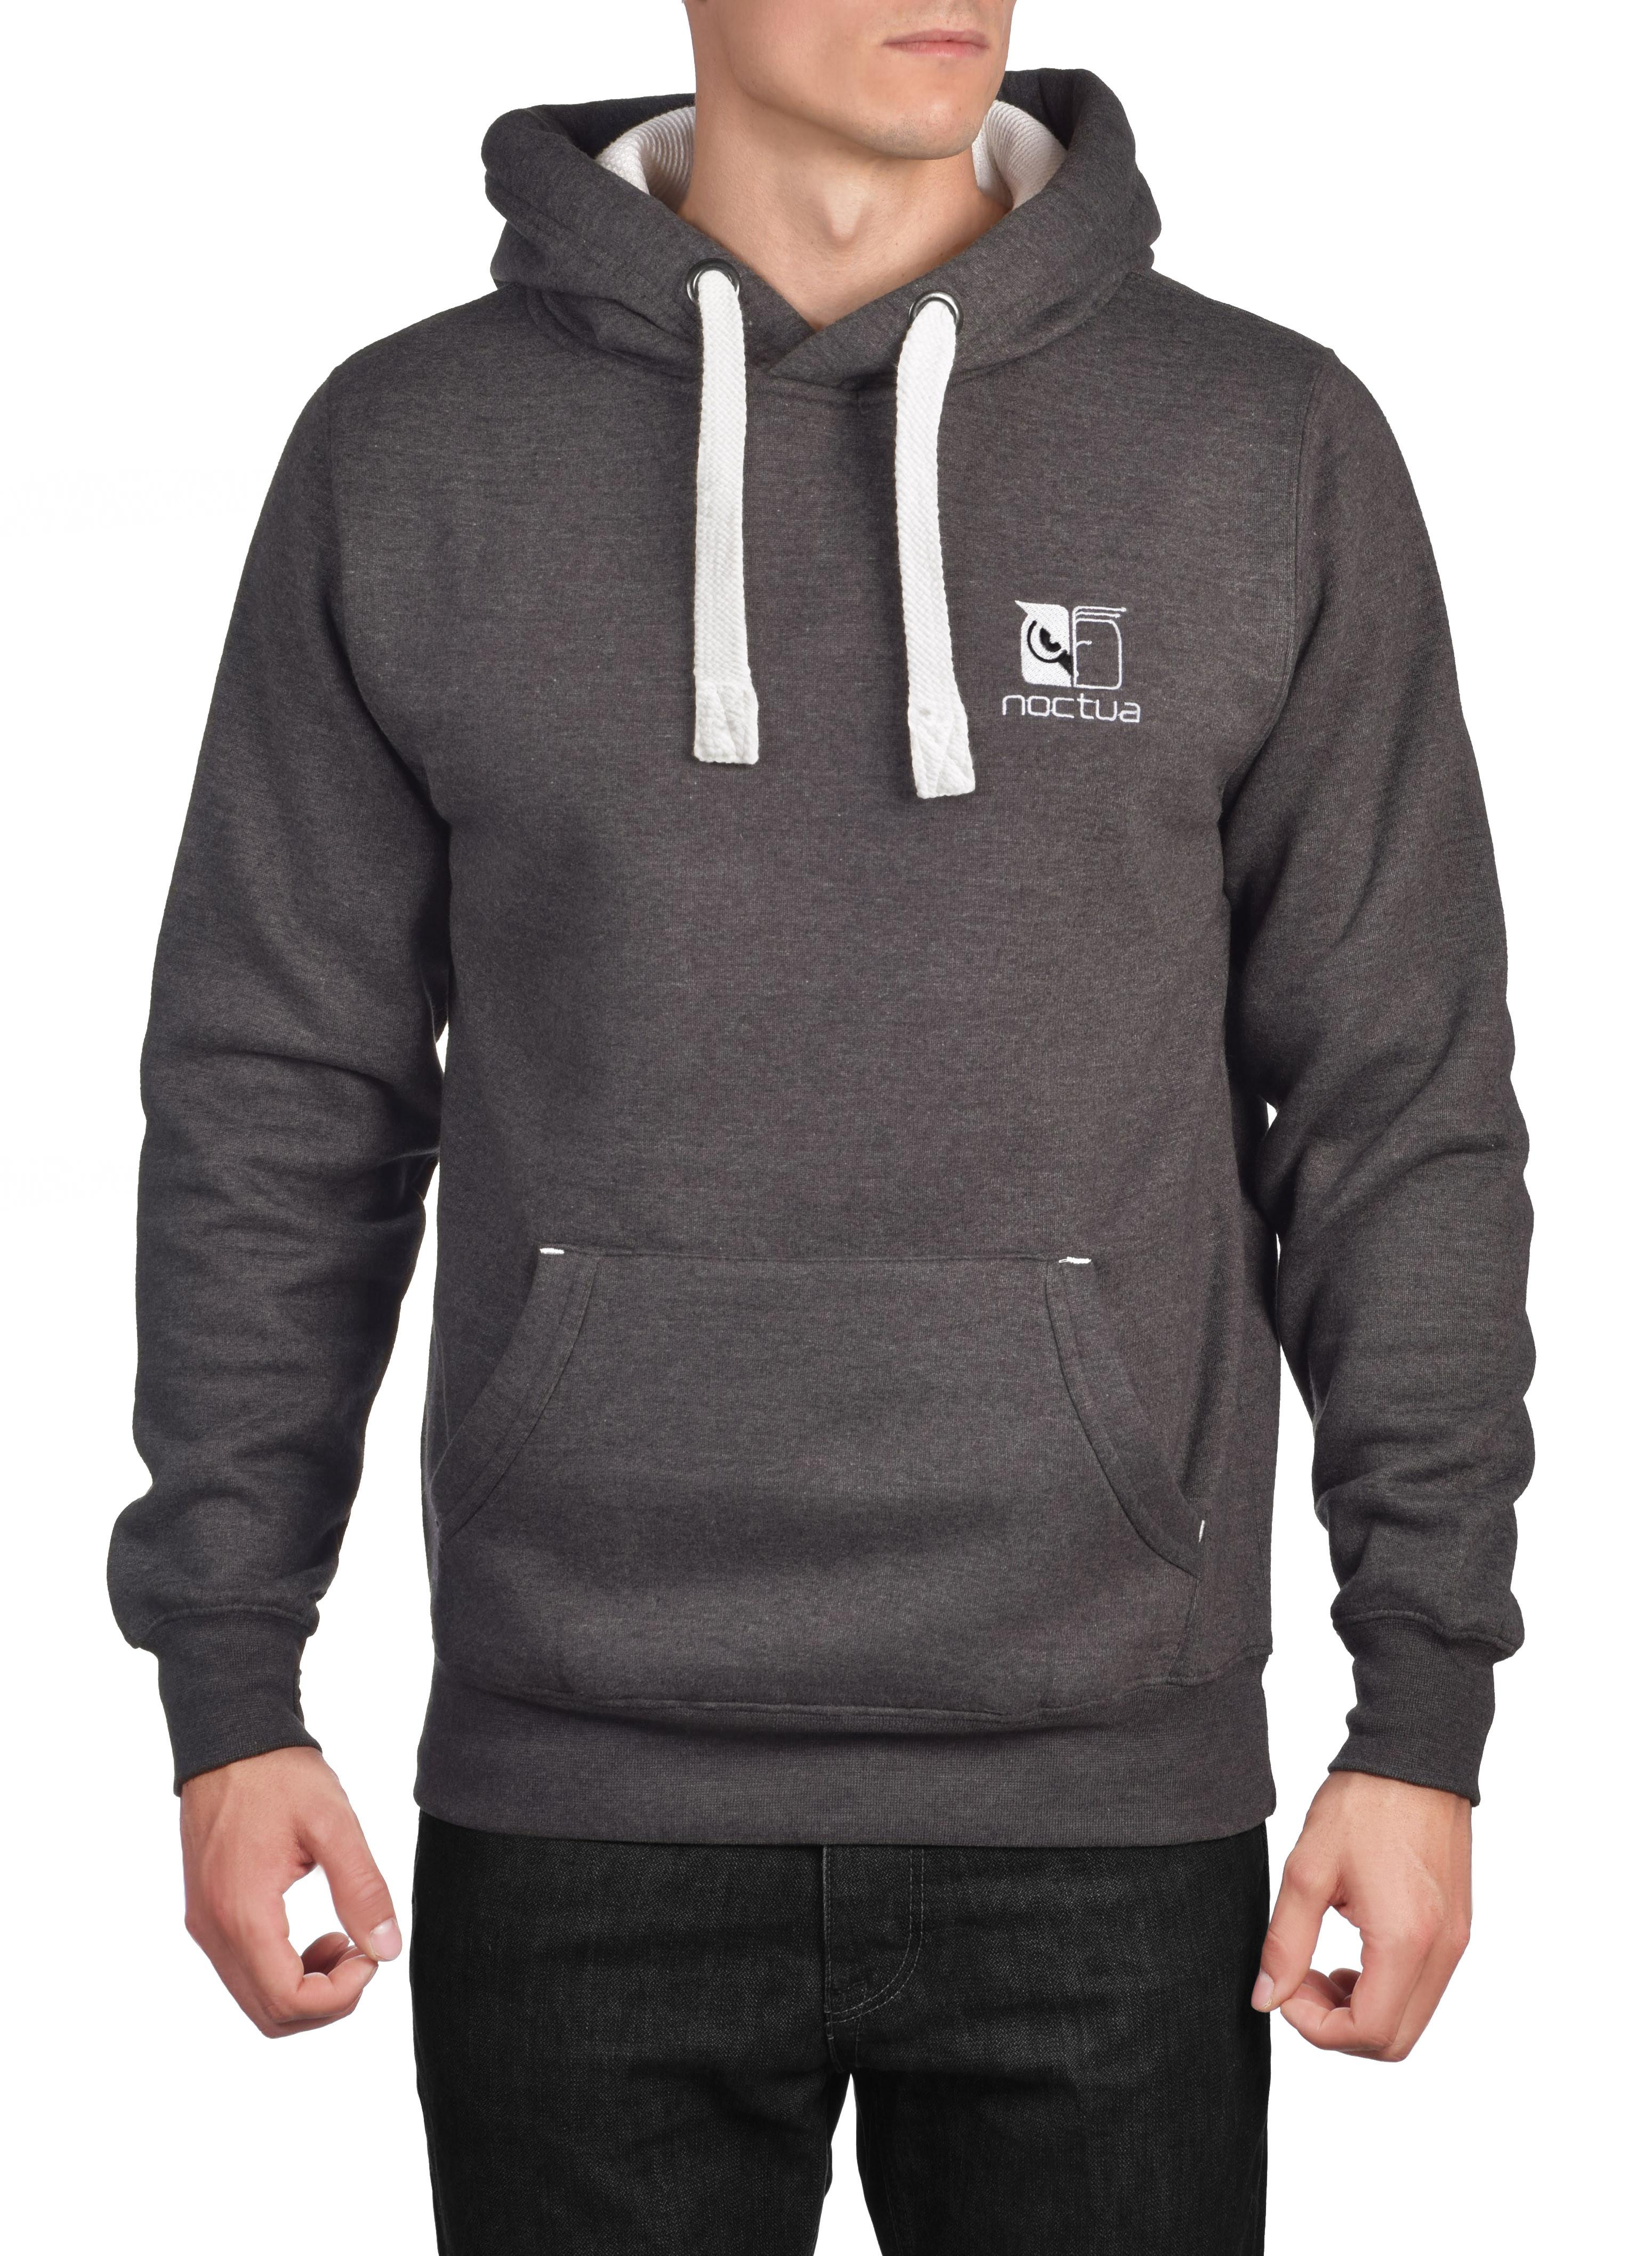 noctua_np_h1_grey_hoodie_1